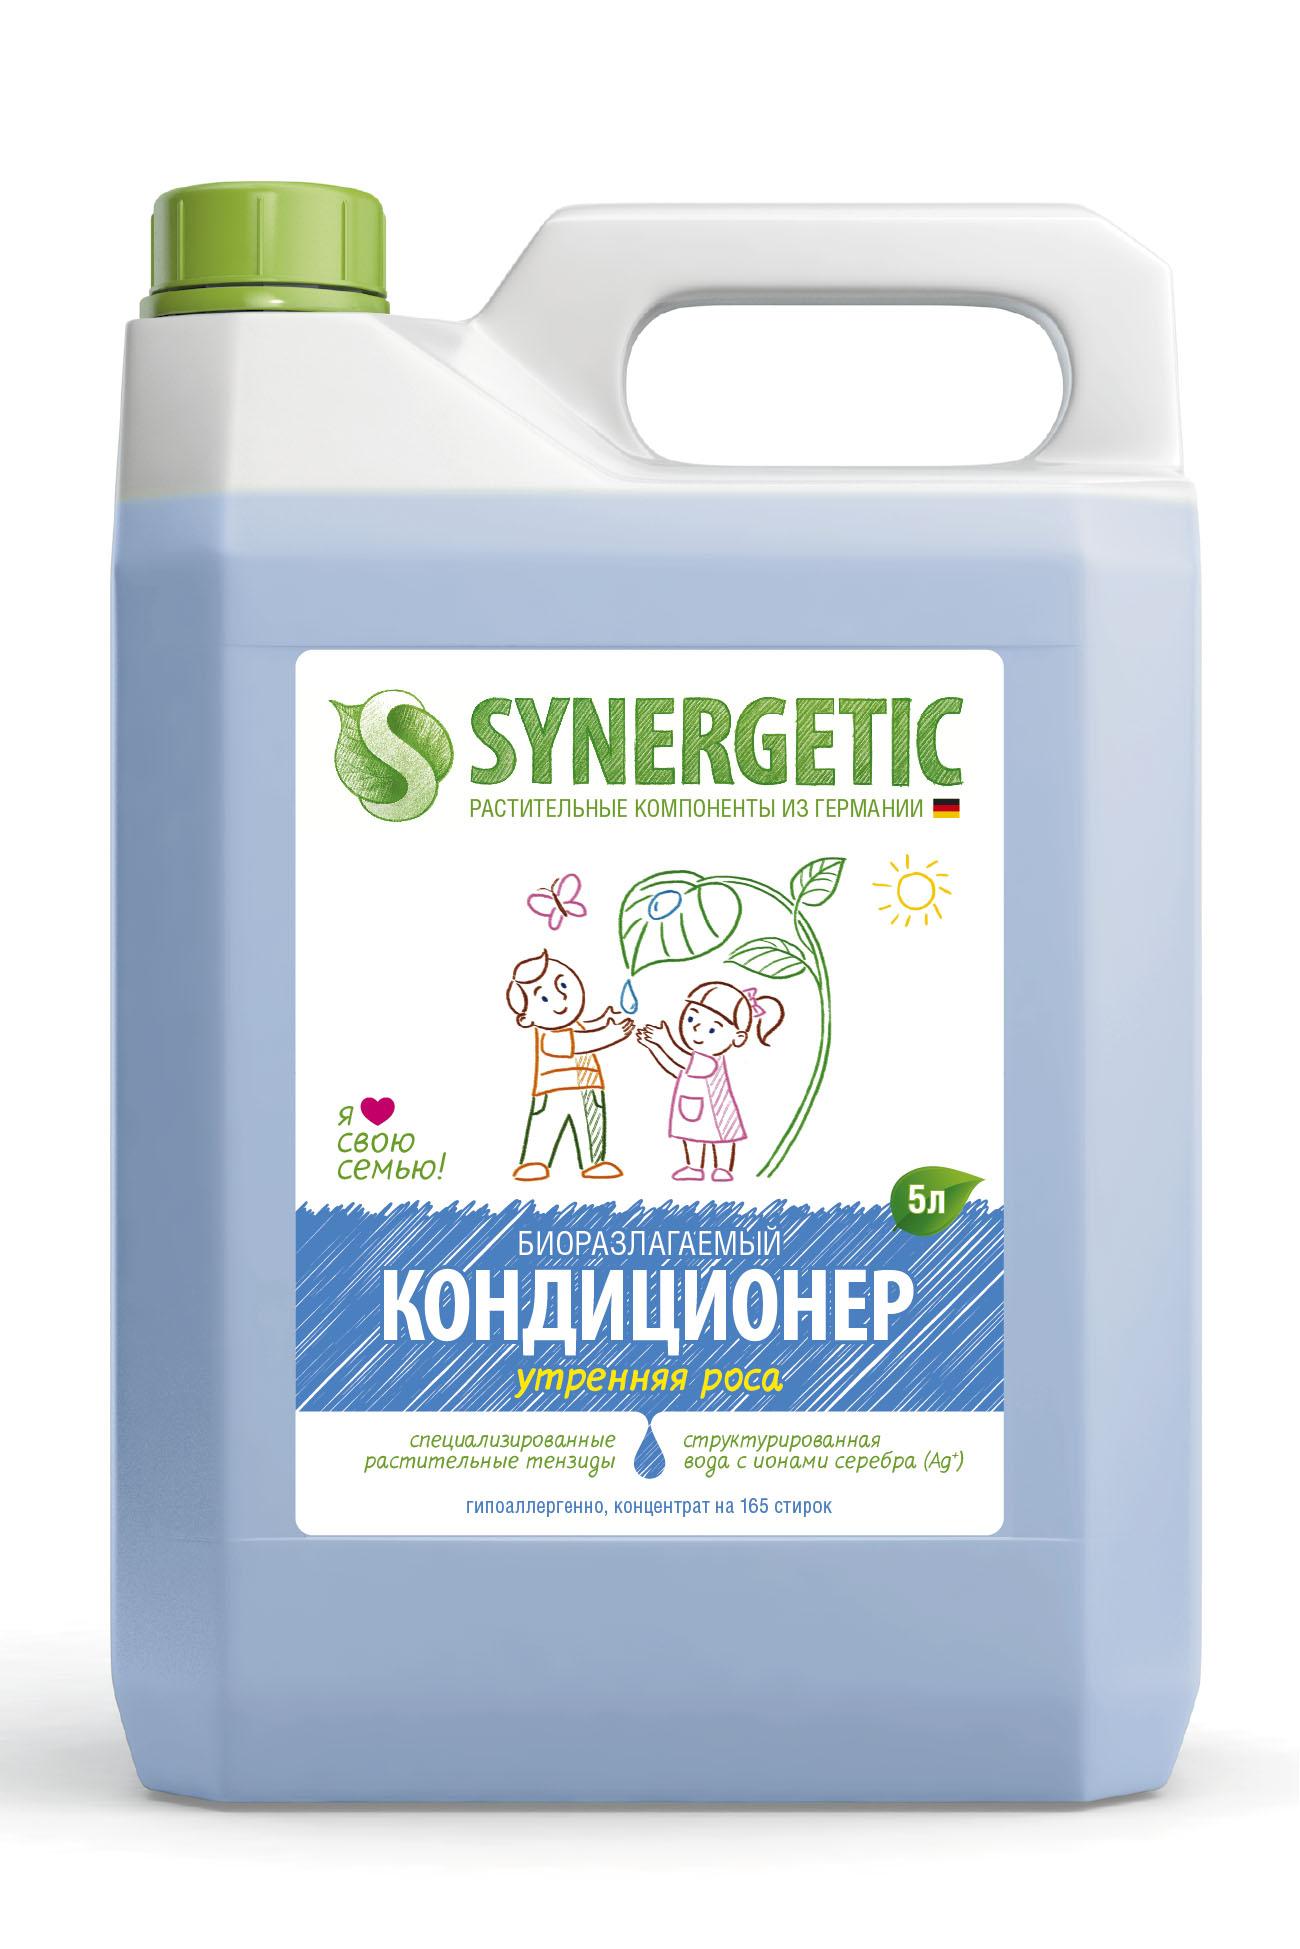 Средства для стирки Synergetic Кондиционер для белья Synergetic «Утренняя роса» 5 л кондиционер для белья synergetic 5 л